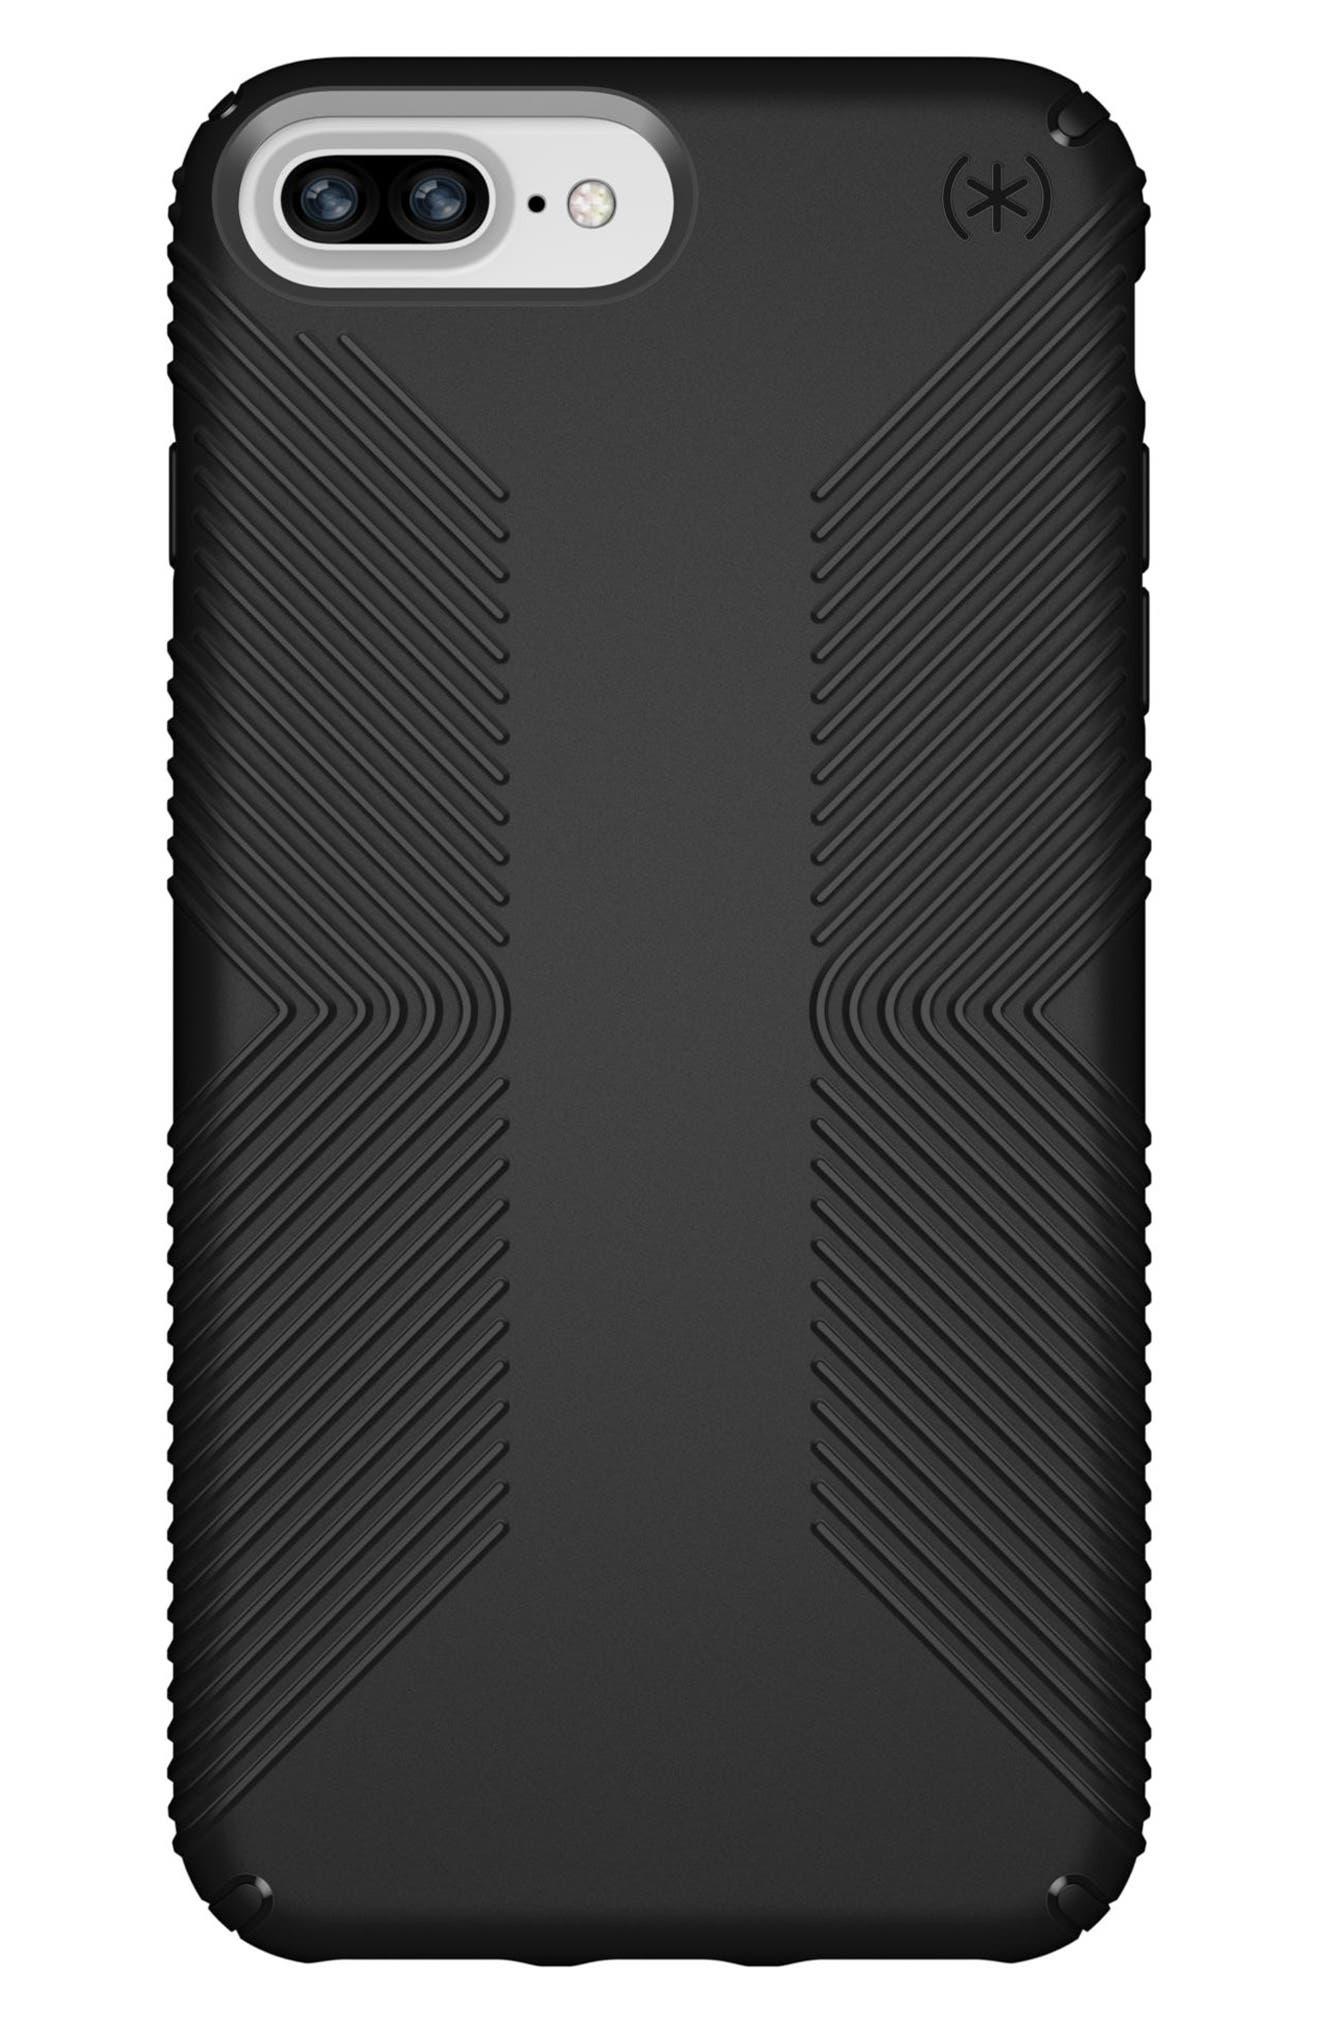 Grip iPhone 6/6s/7/8 Plus Case,                         Main,                         color, Black/ Black